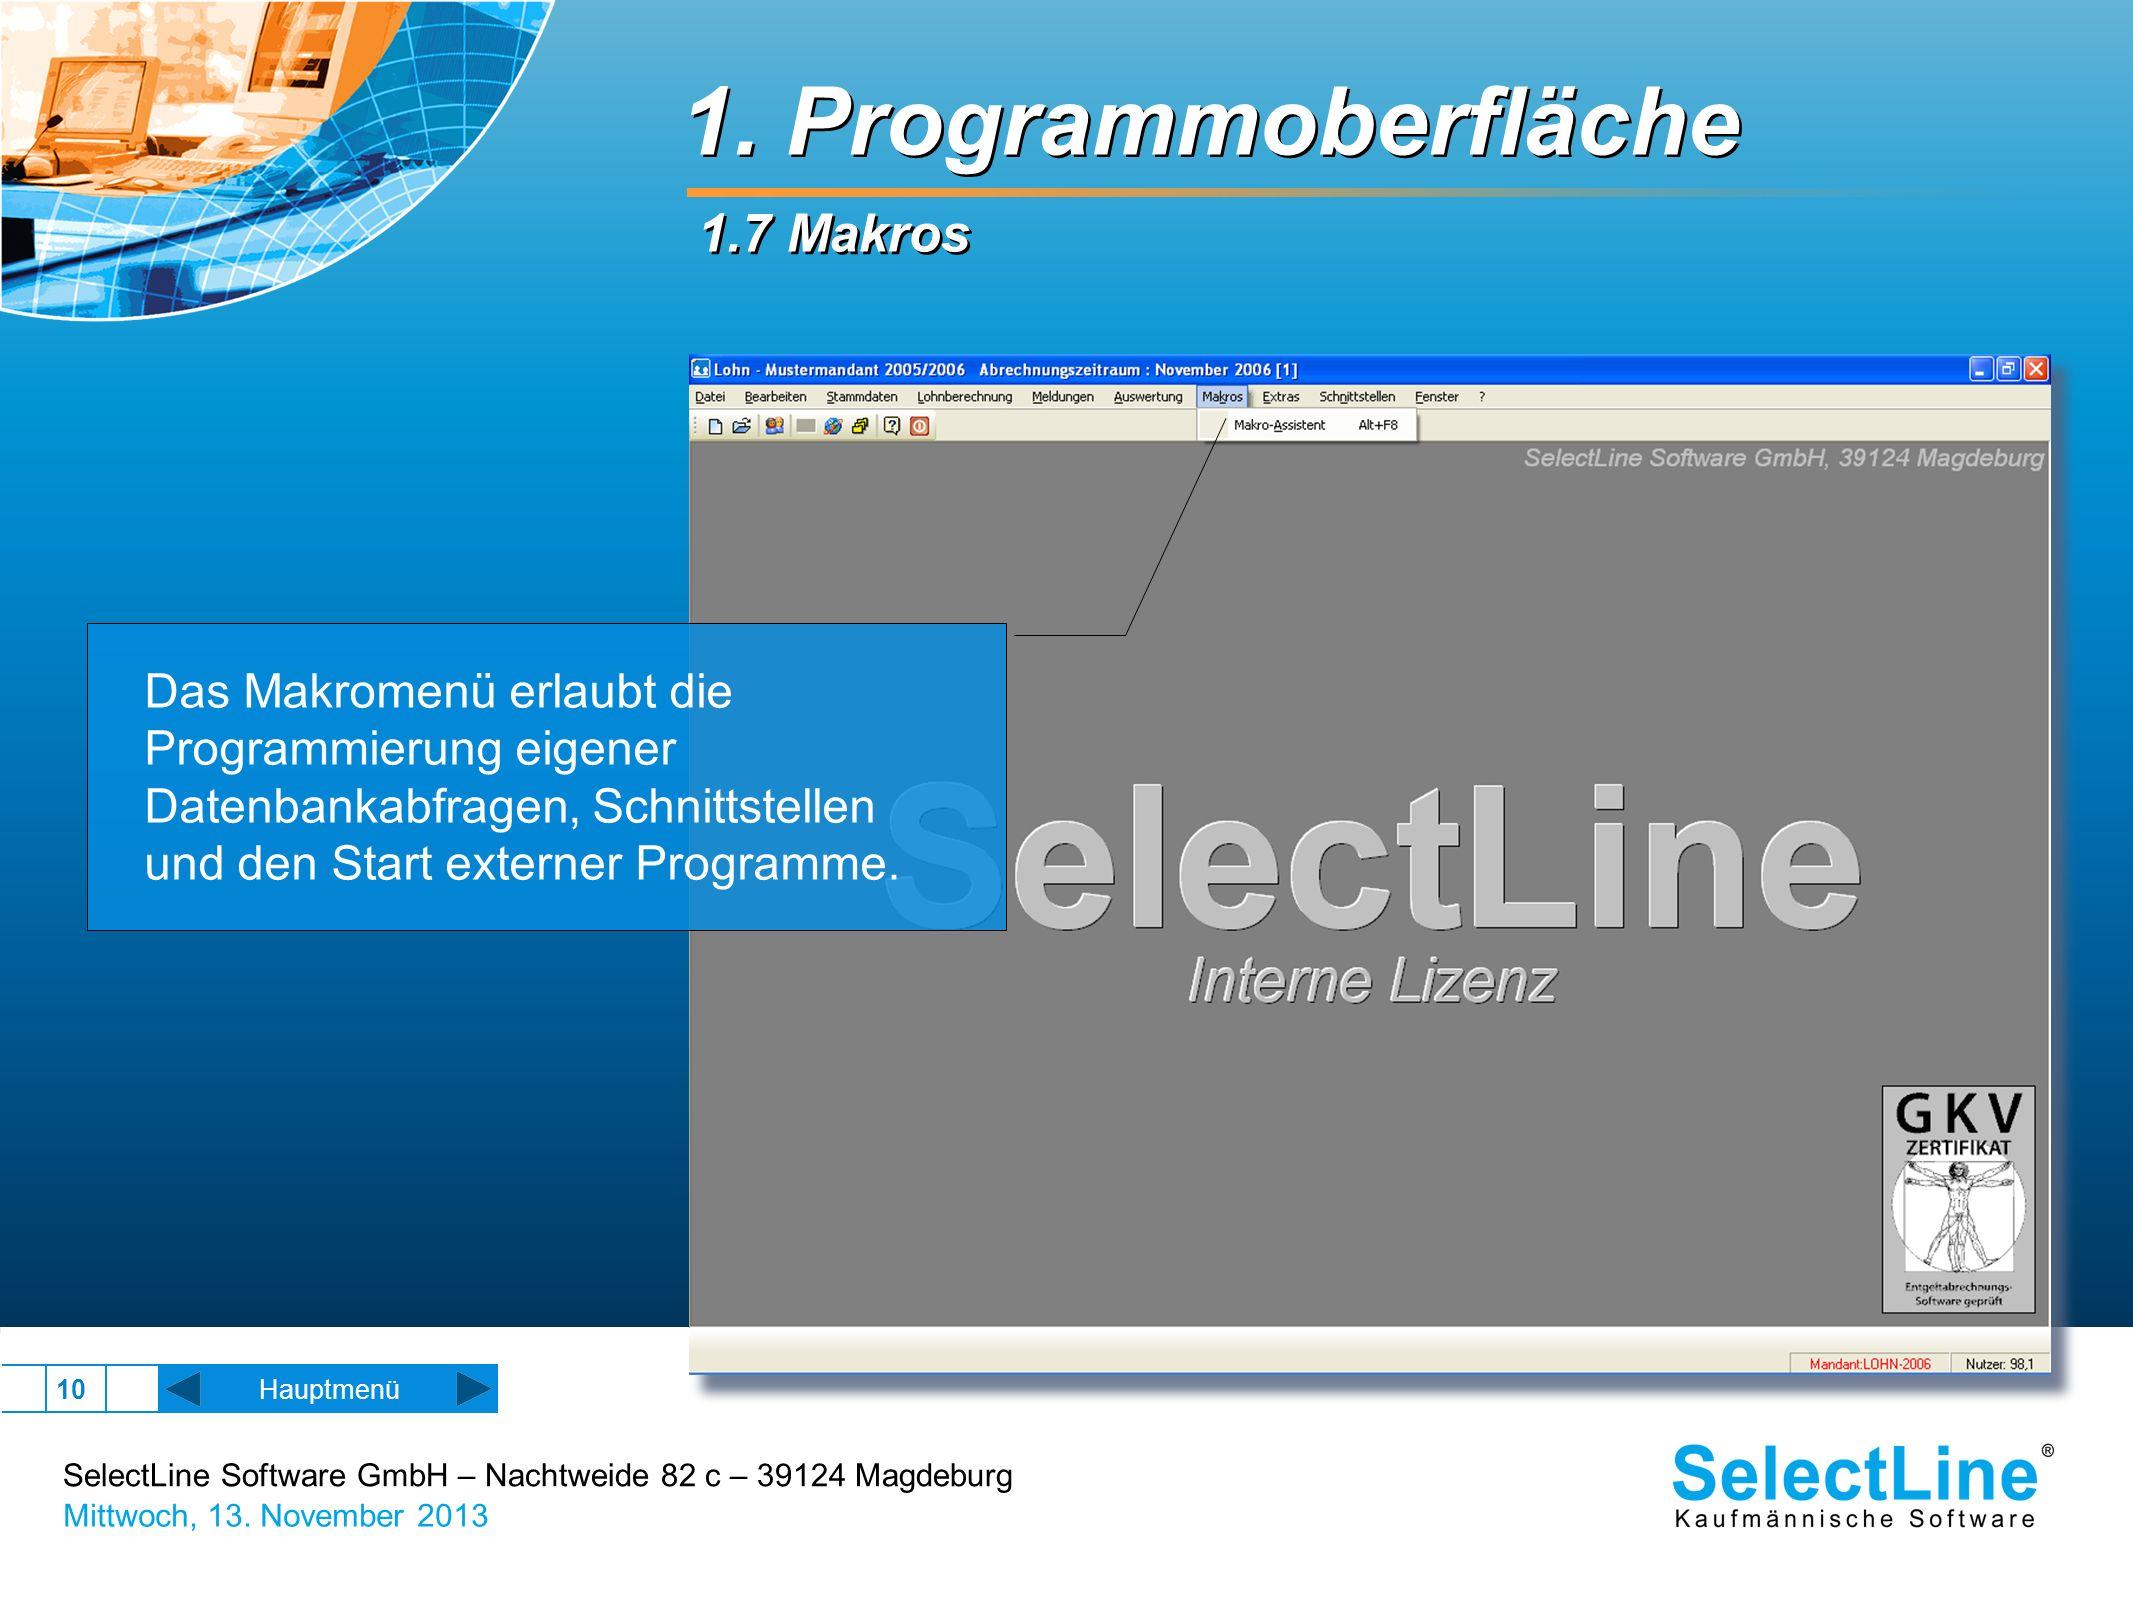 1. Programmoberfläche 1.7 Makros